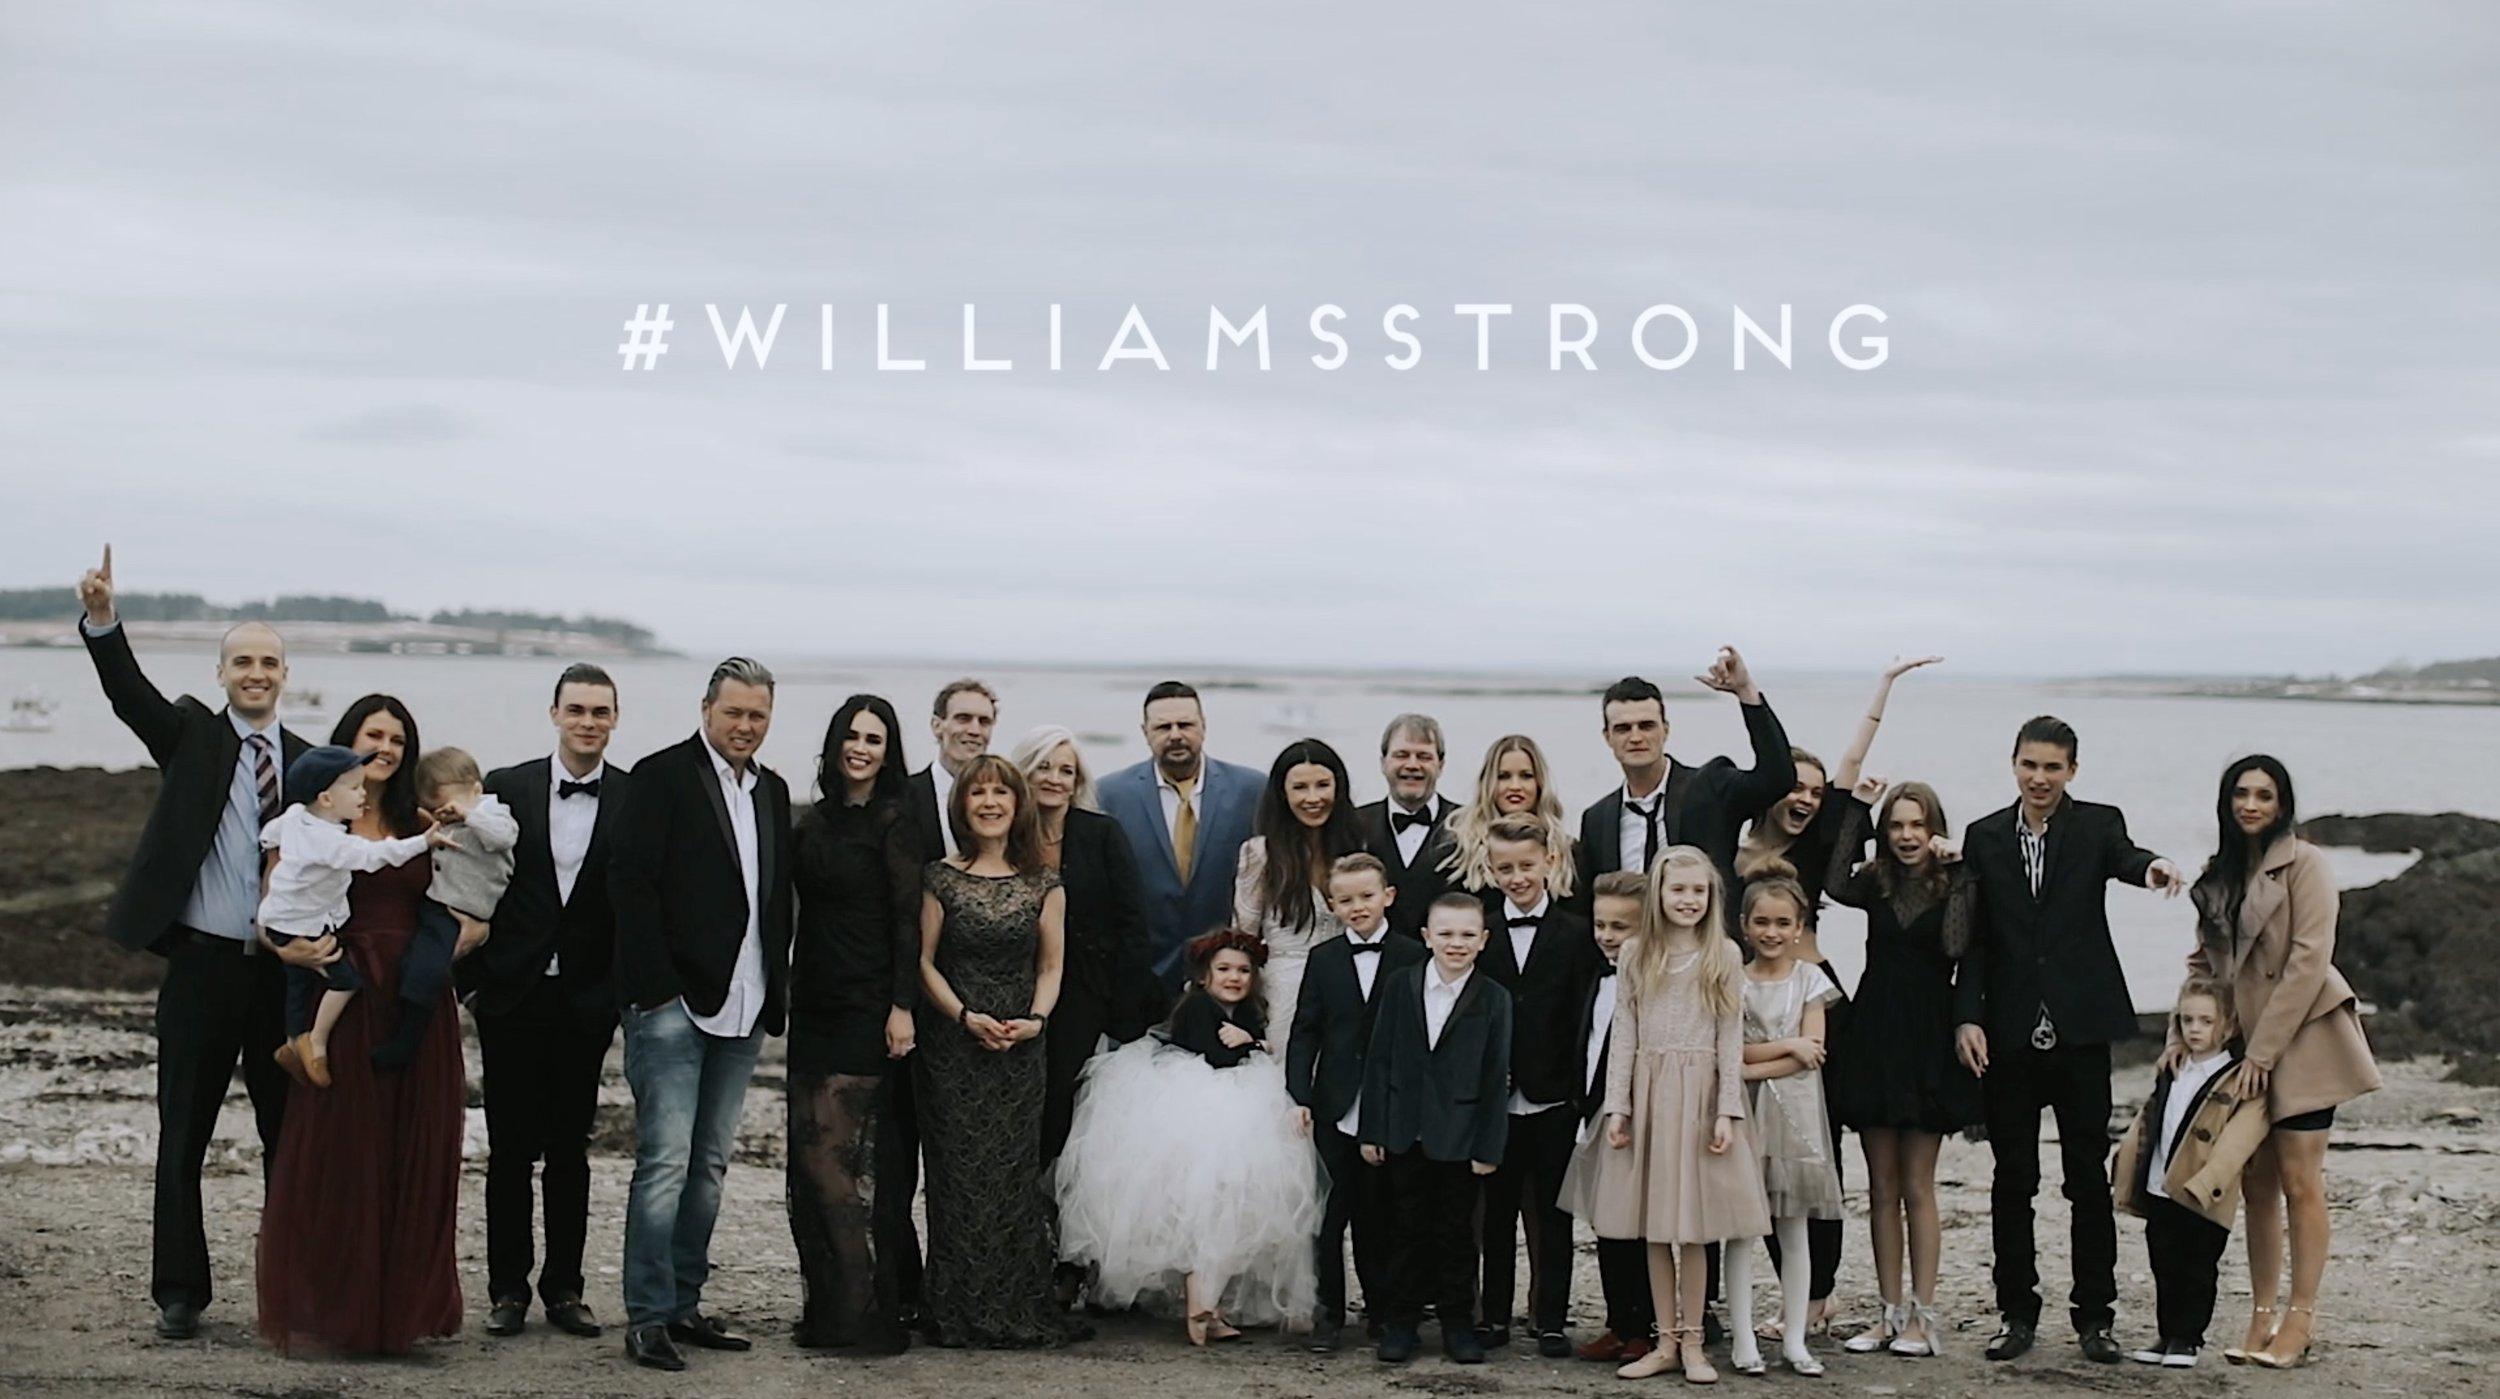 williams strong.jpg